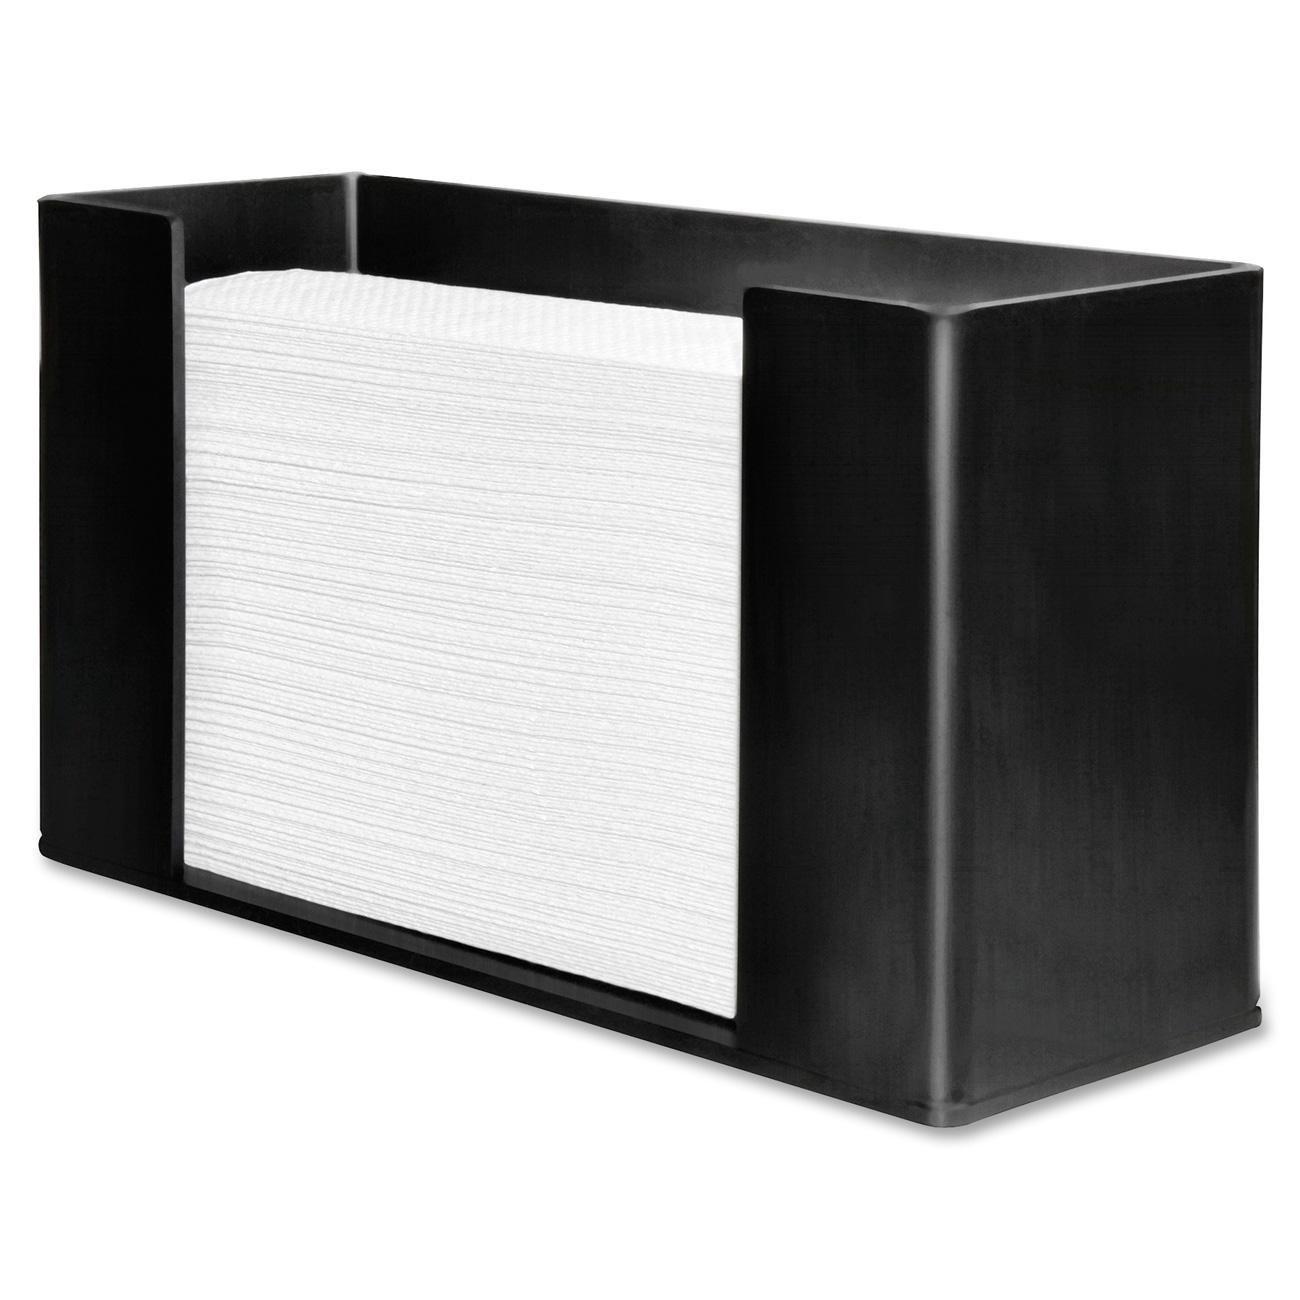 Genuine Joe GJO11524 Acrylic C Fold/Multifold Paper Towel Dispenser, 11-1/2'' Length x 4-3/32'' Width x 6-51/64'' Height, Black (3)